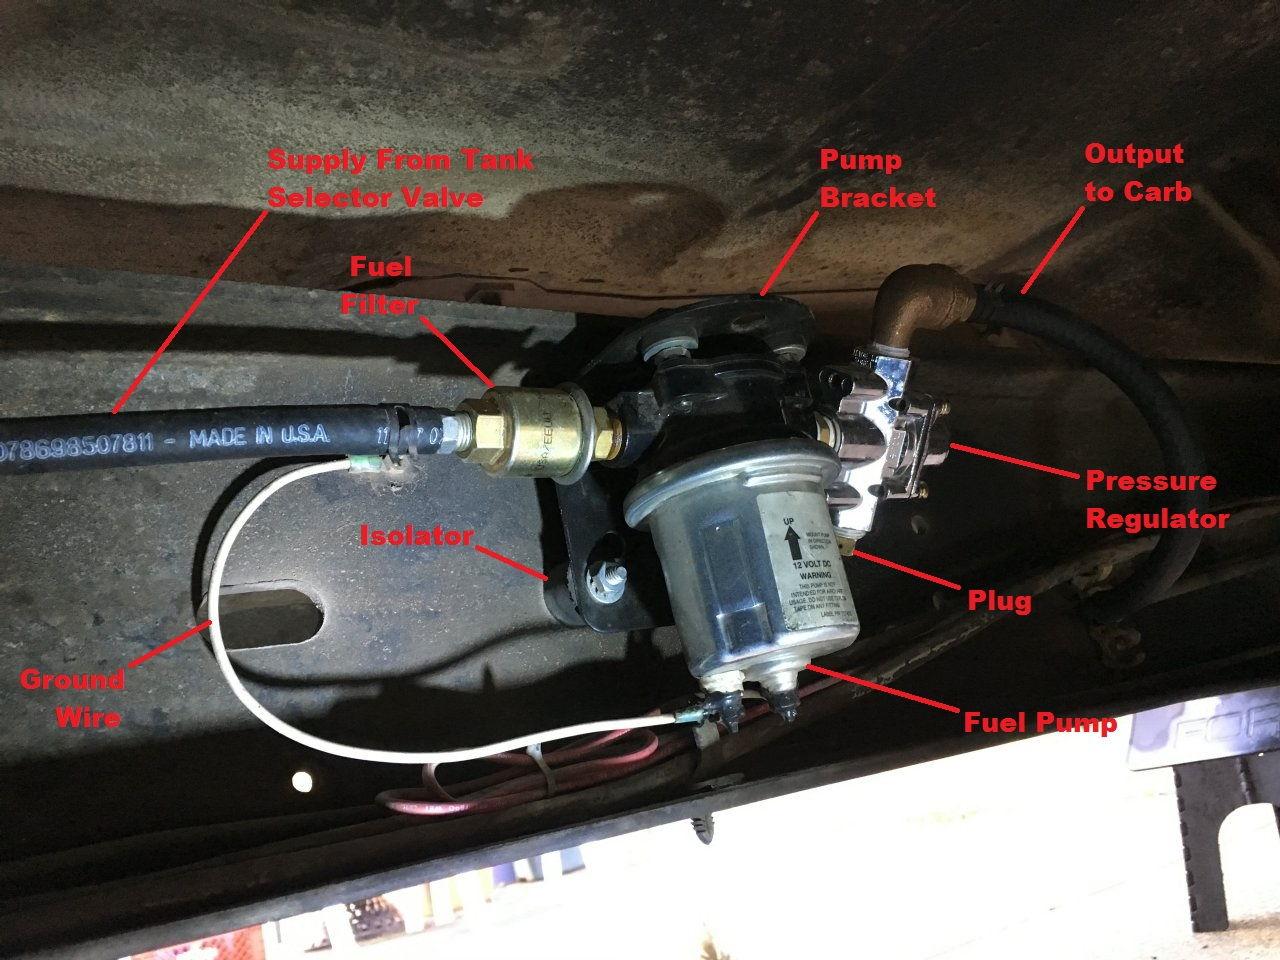 2005 polaris phoenix wiring diagram polaris phoenix 200 wiring diagram  polaris ignition wiring diagram 2005 polaris